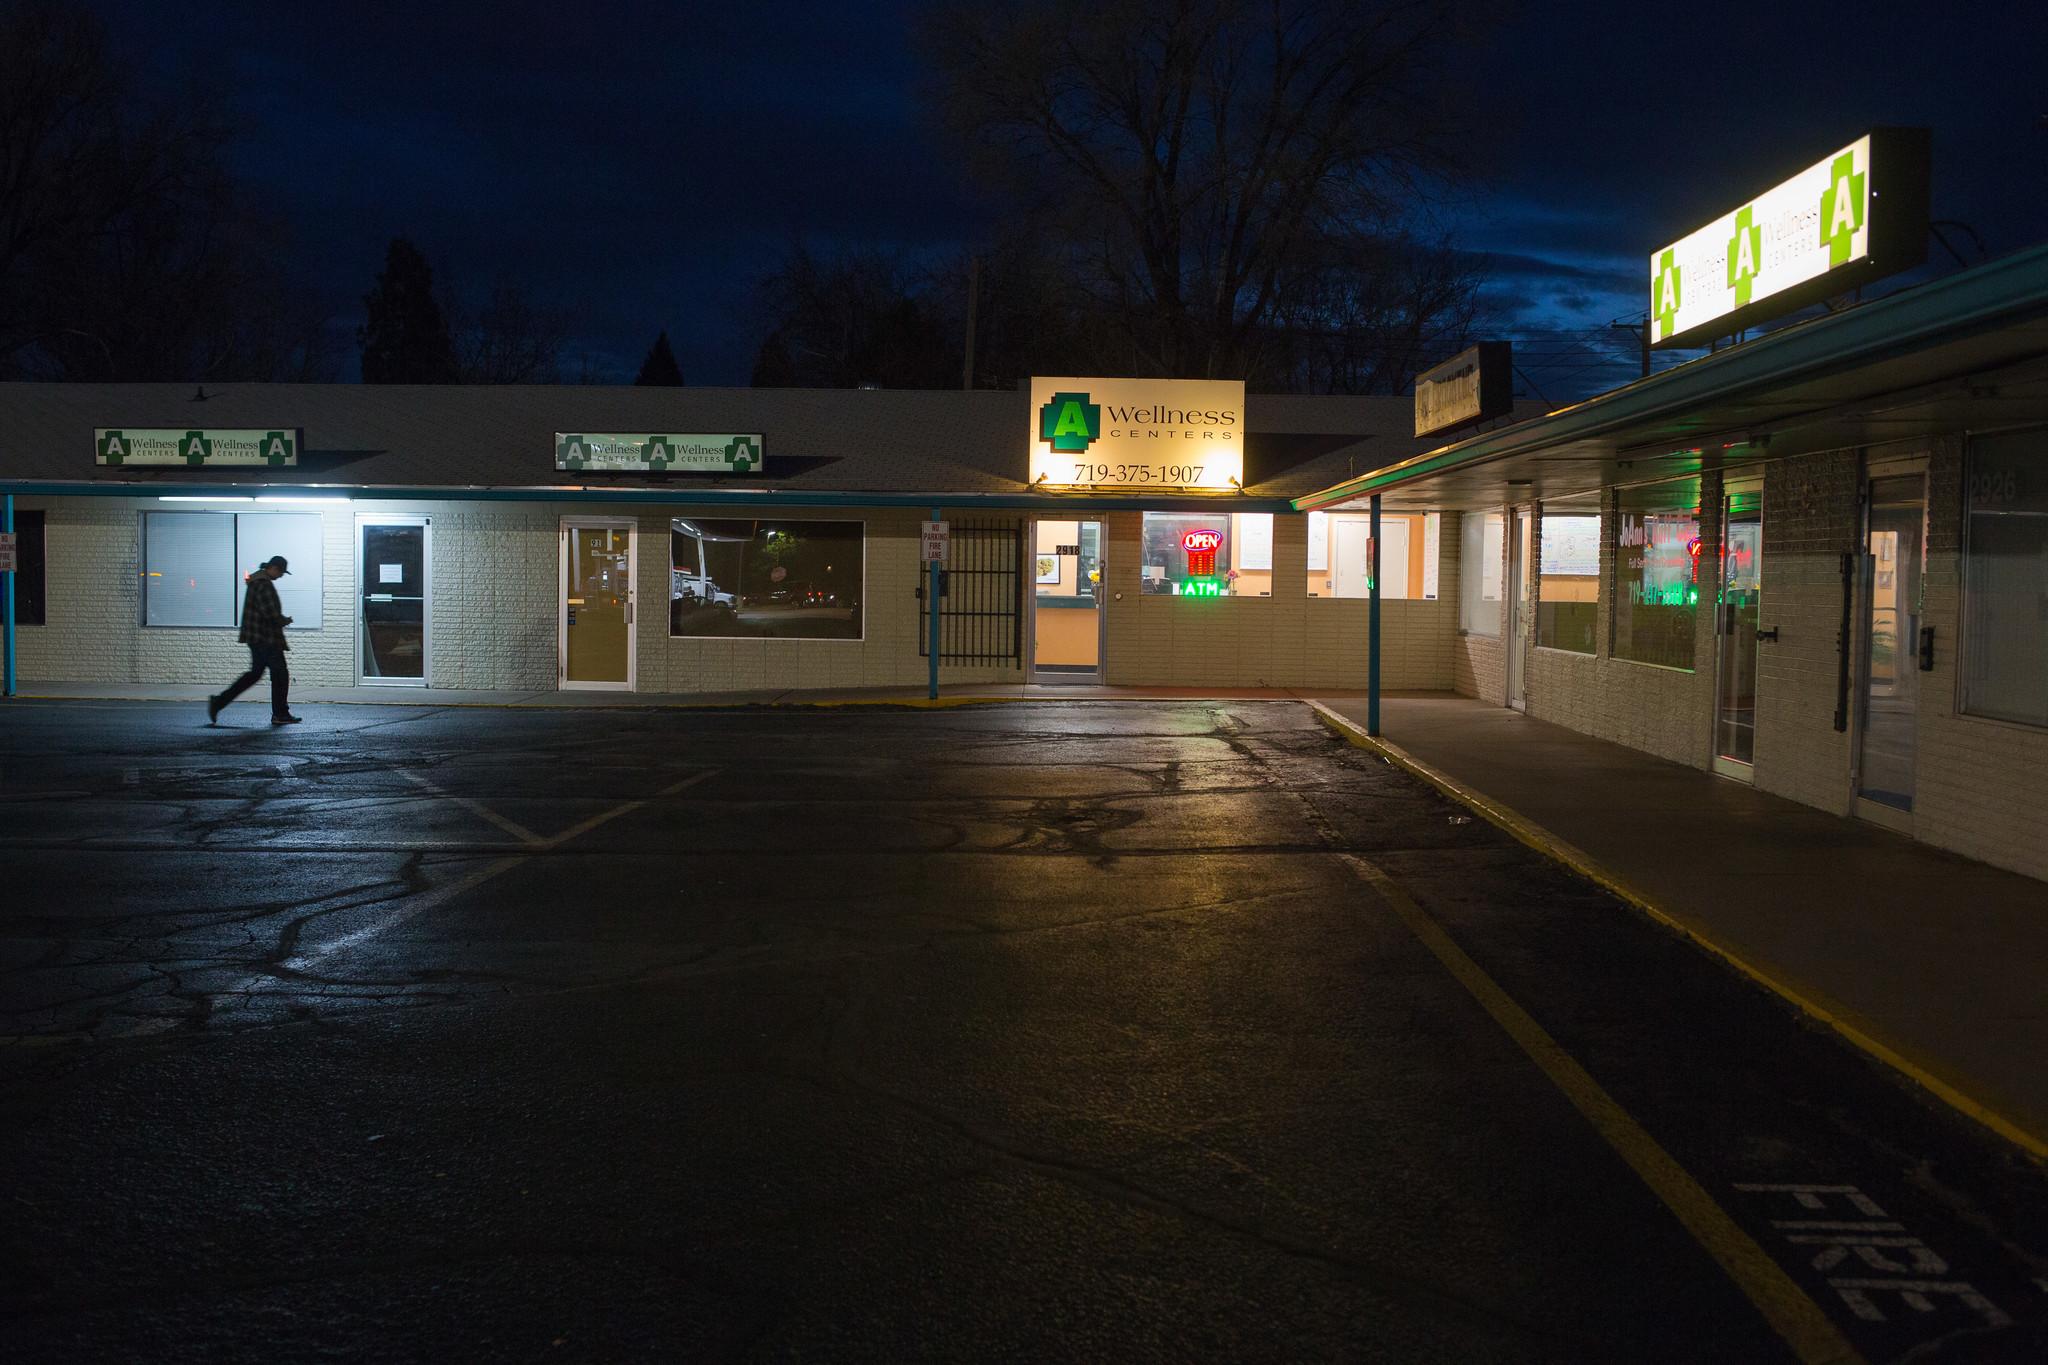 weed dating colorado springs Find medical marijuana dispensaries in colorado springs and read reviews, maps, menus and prices for colorado springs cannabis dispensaries.